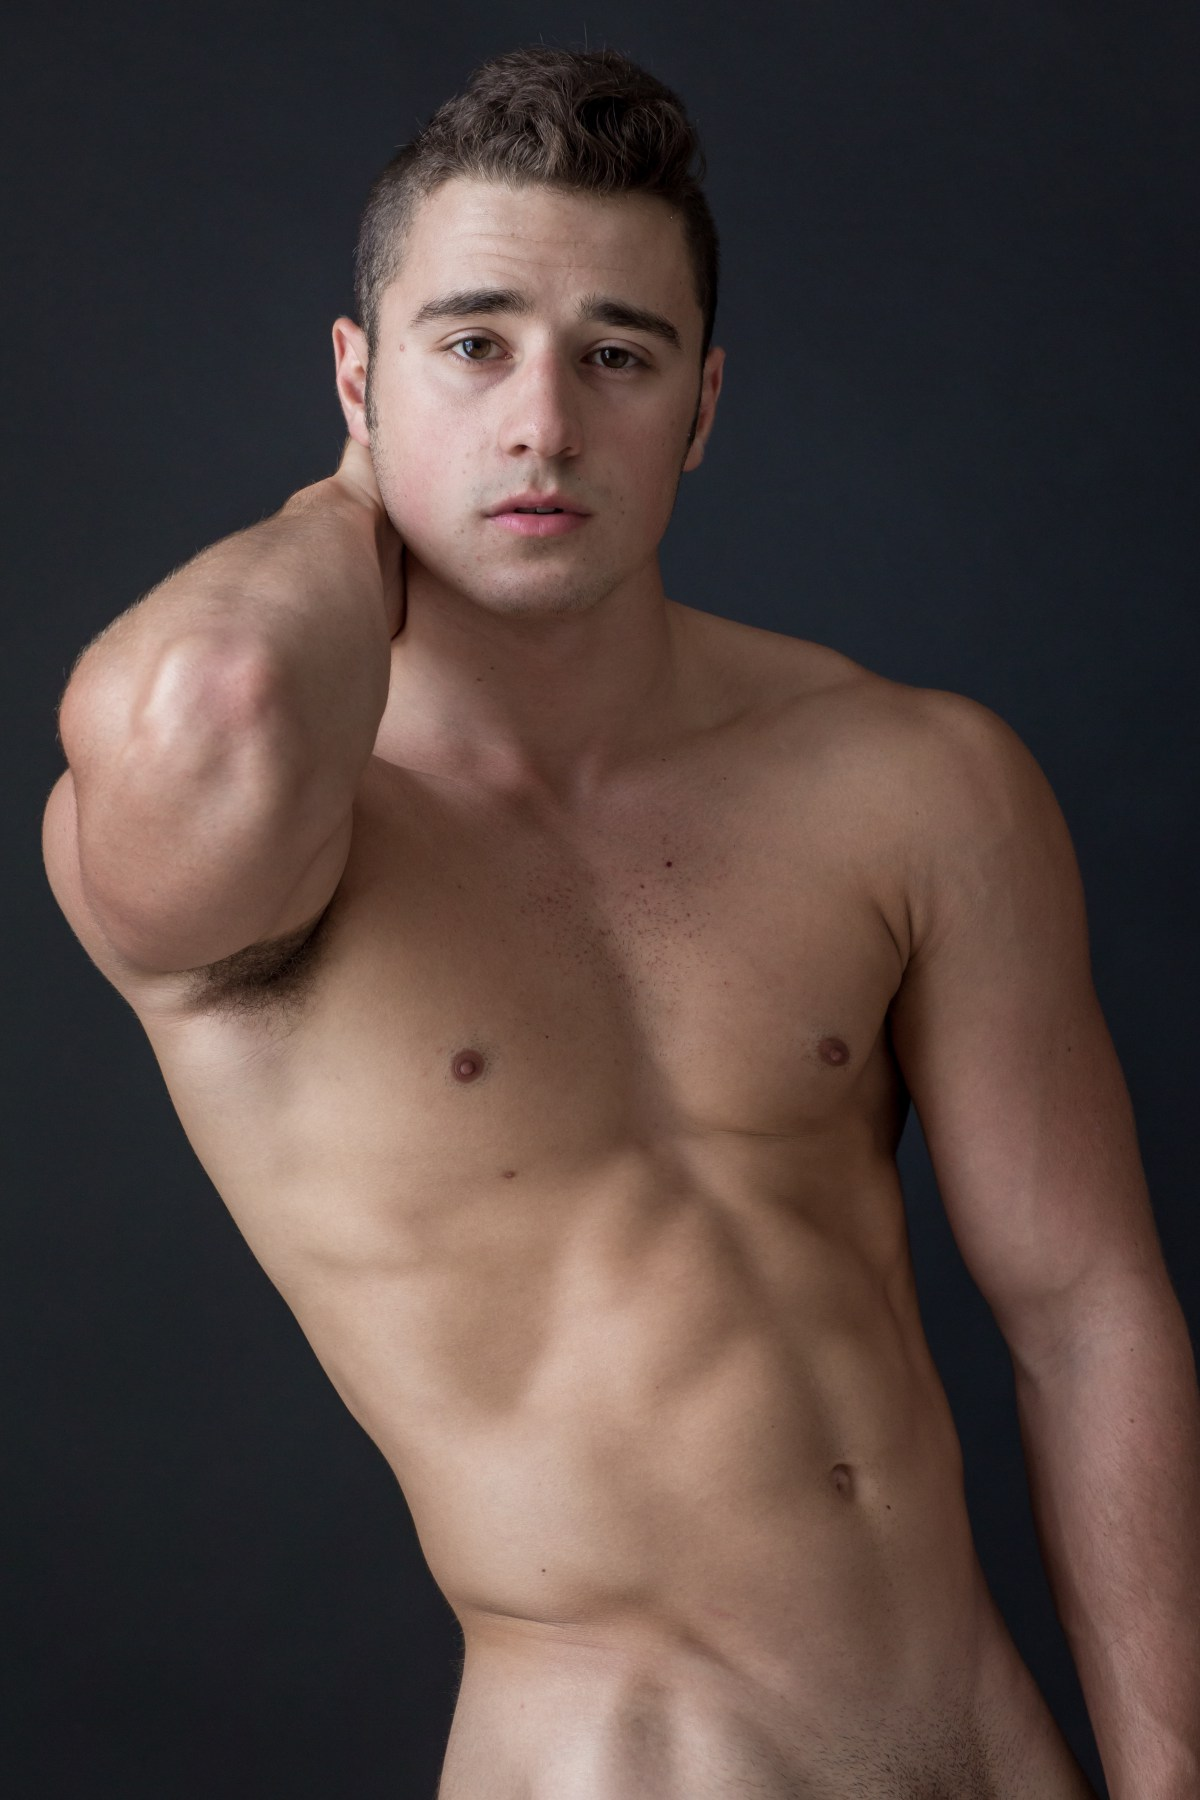 Lance Syverson